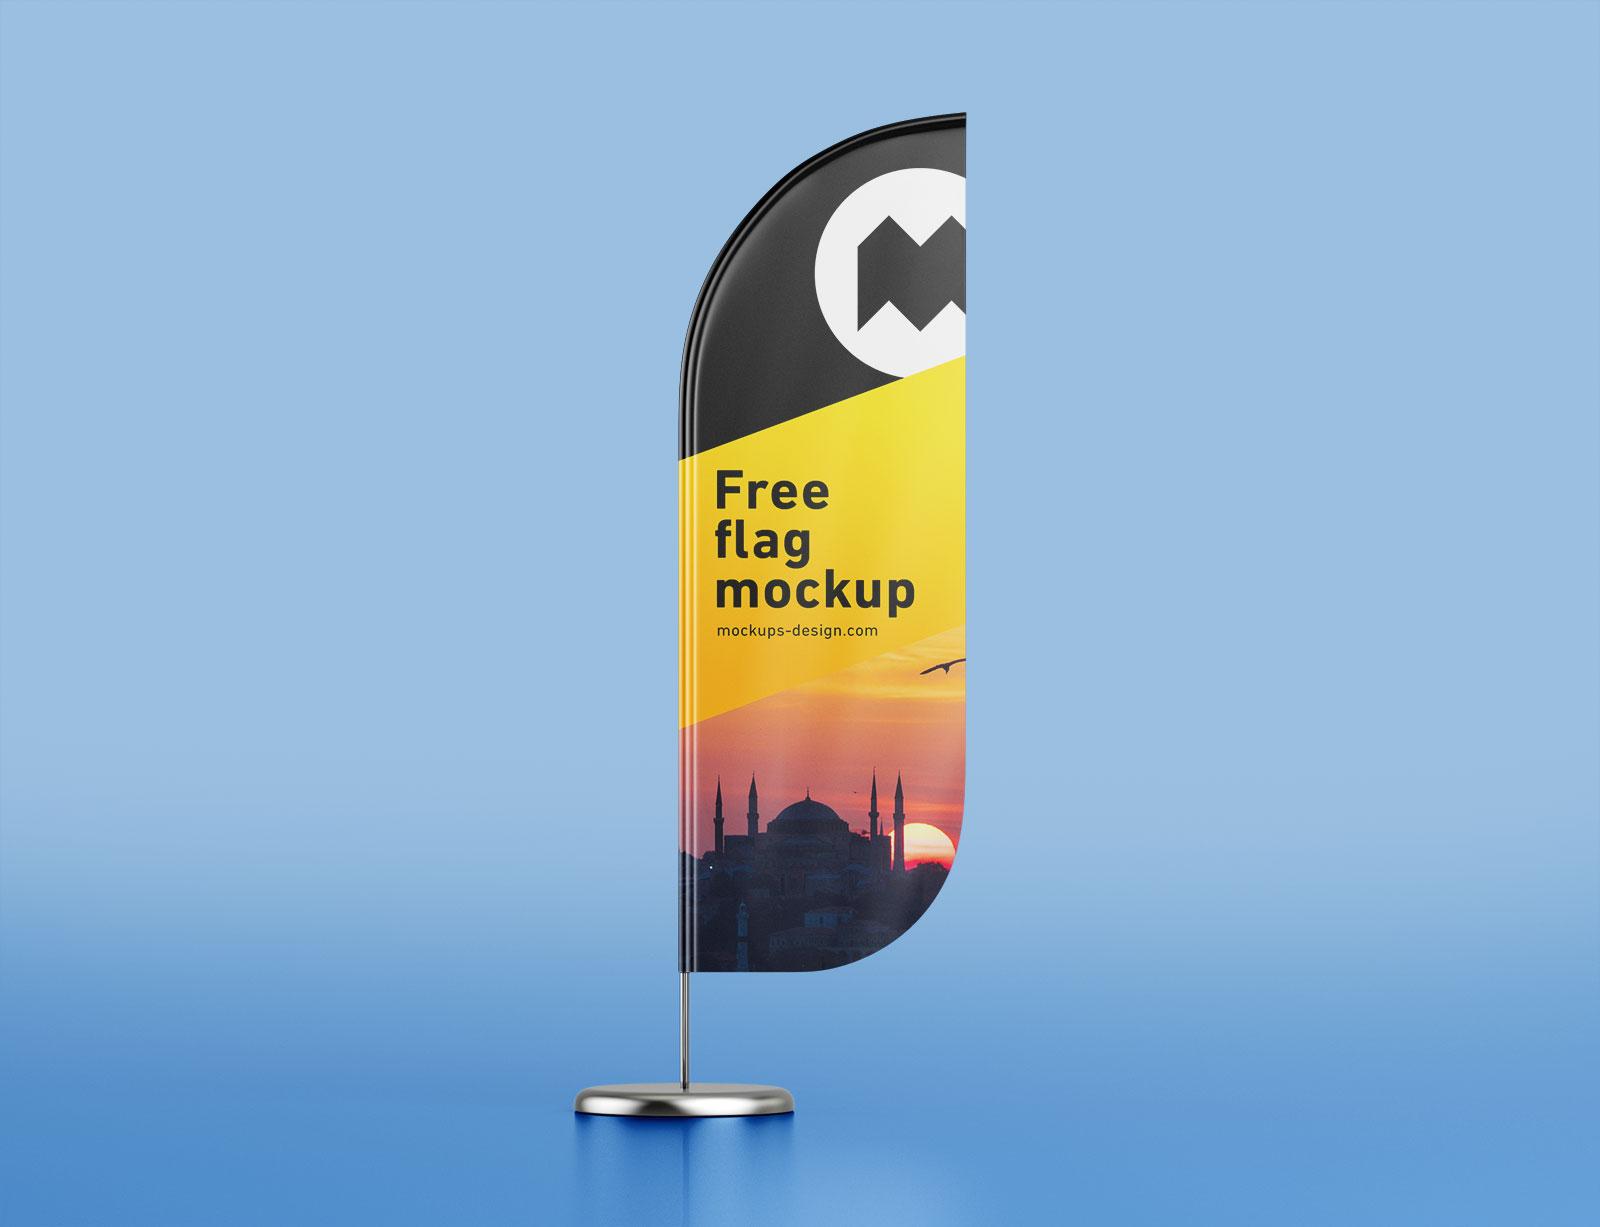 Free-Promotional-Winder-Feather-Flag-Mockup-PSD-Set-3